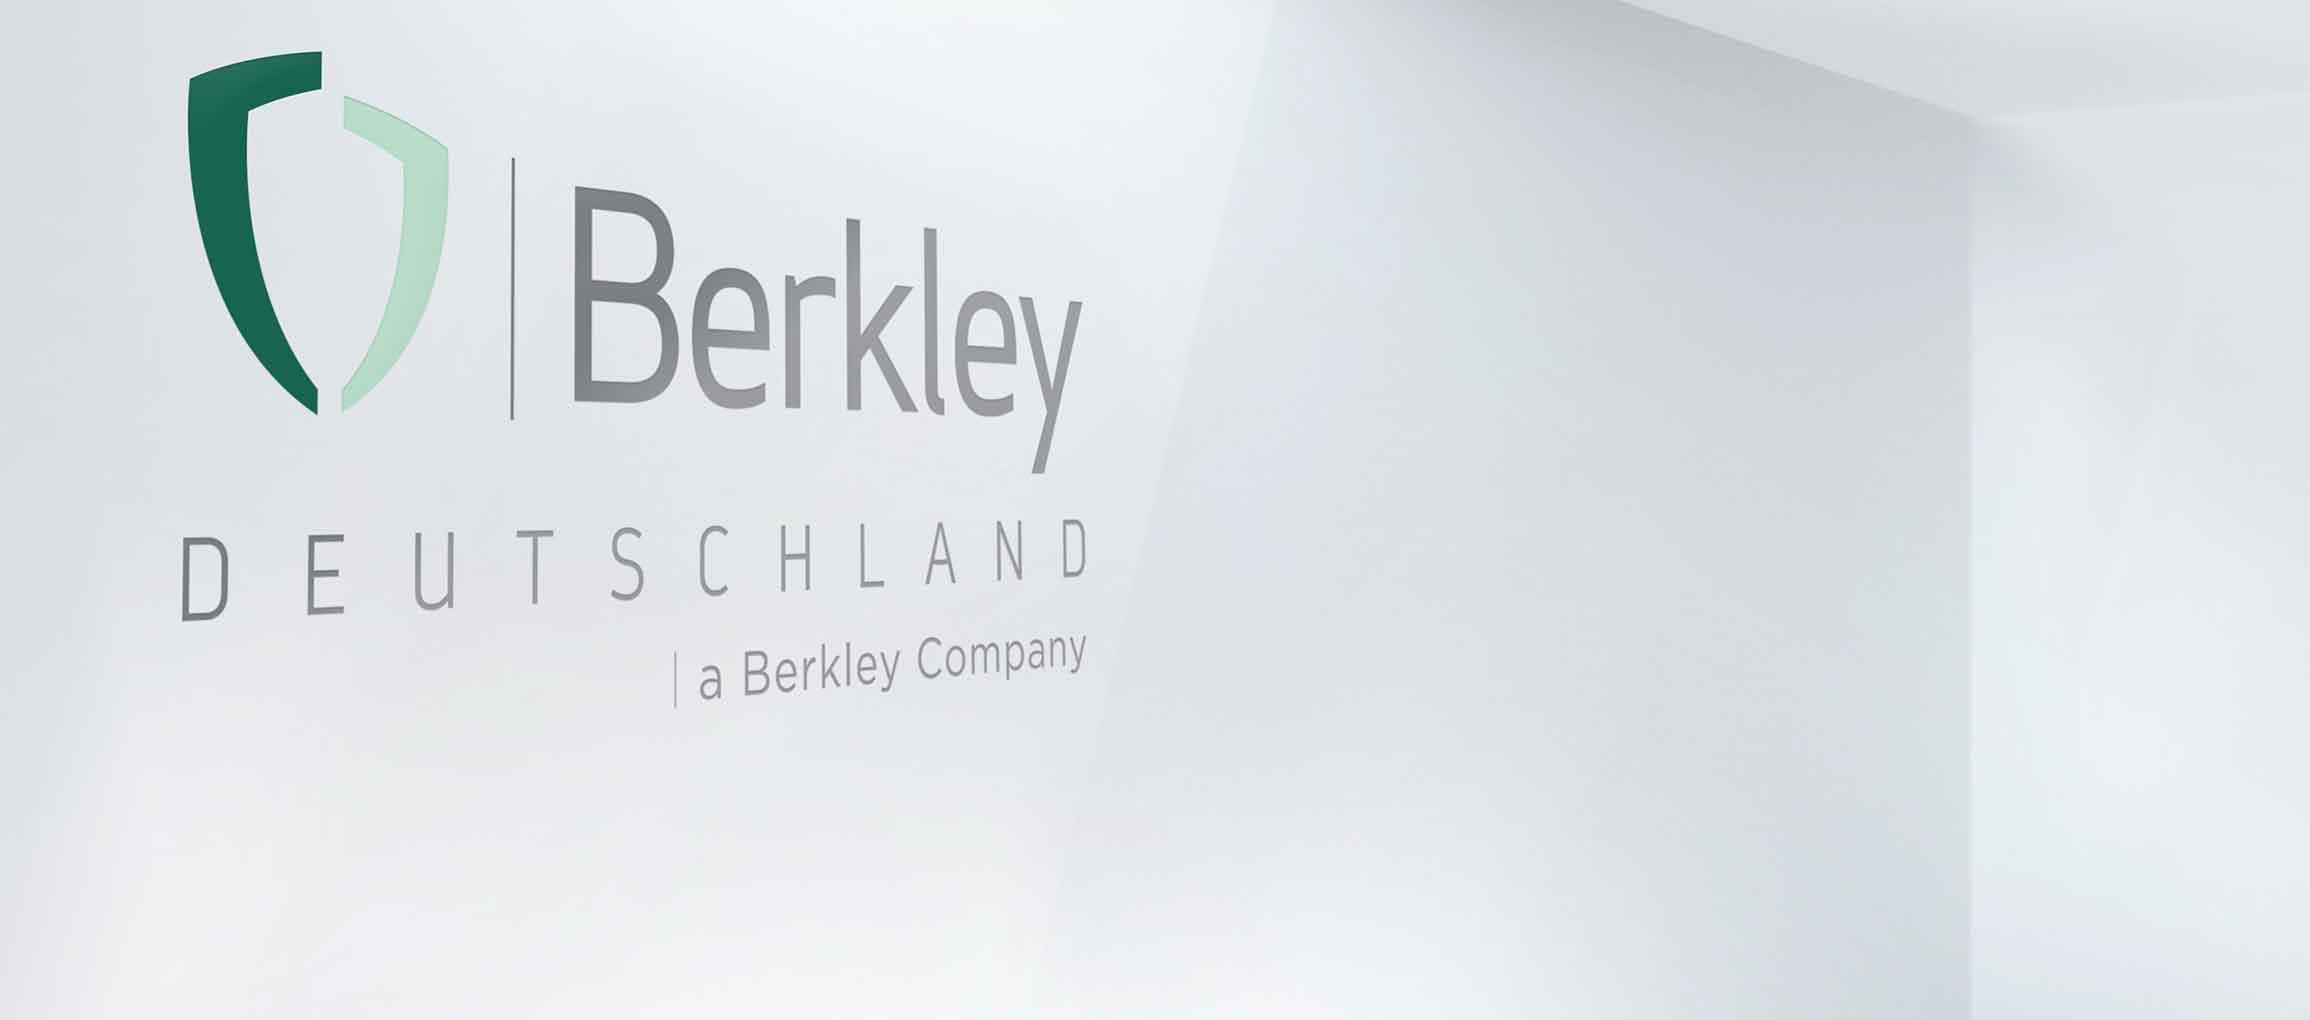 W. R. Berkley Europe: Corporate Design Relaunch